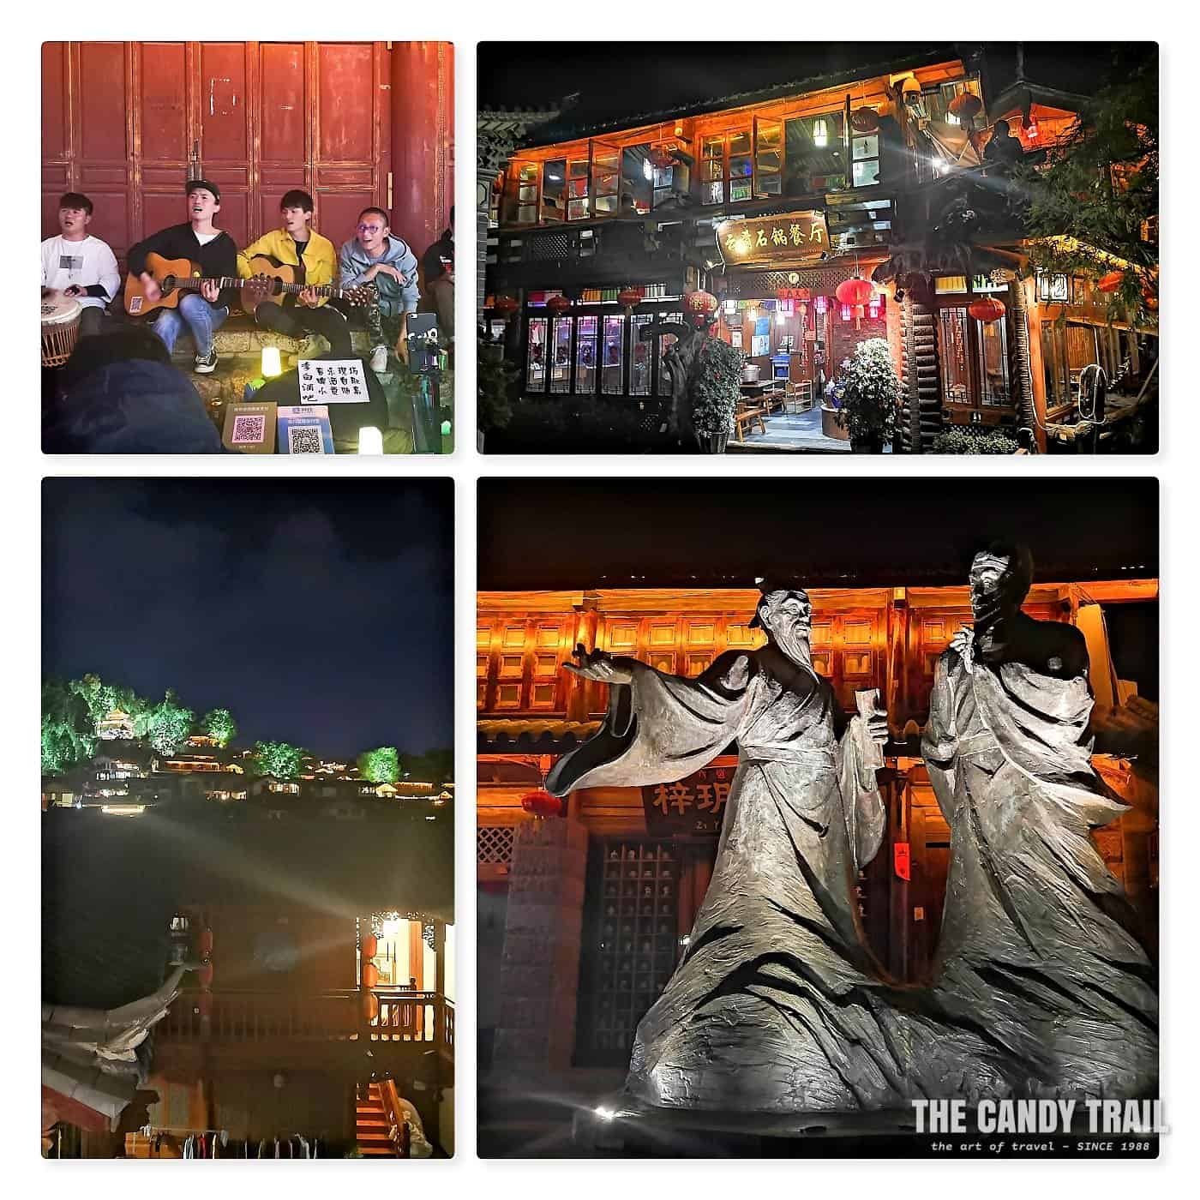 Old town of Lijiang at night in China